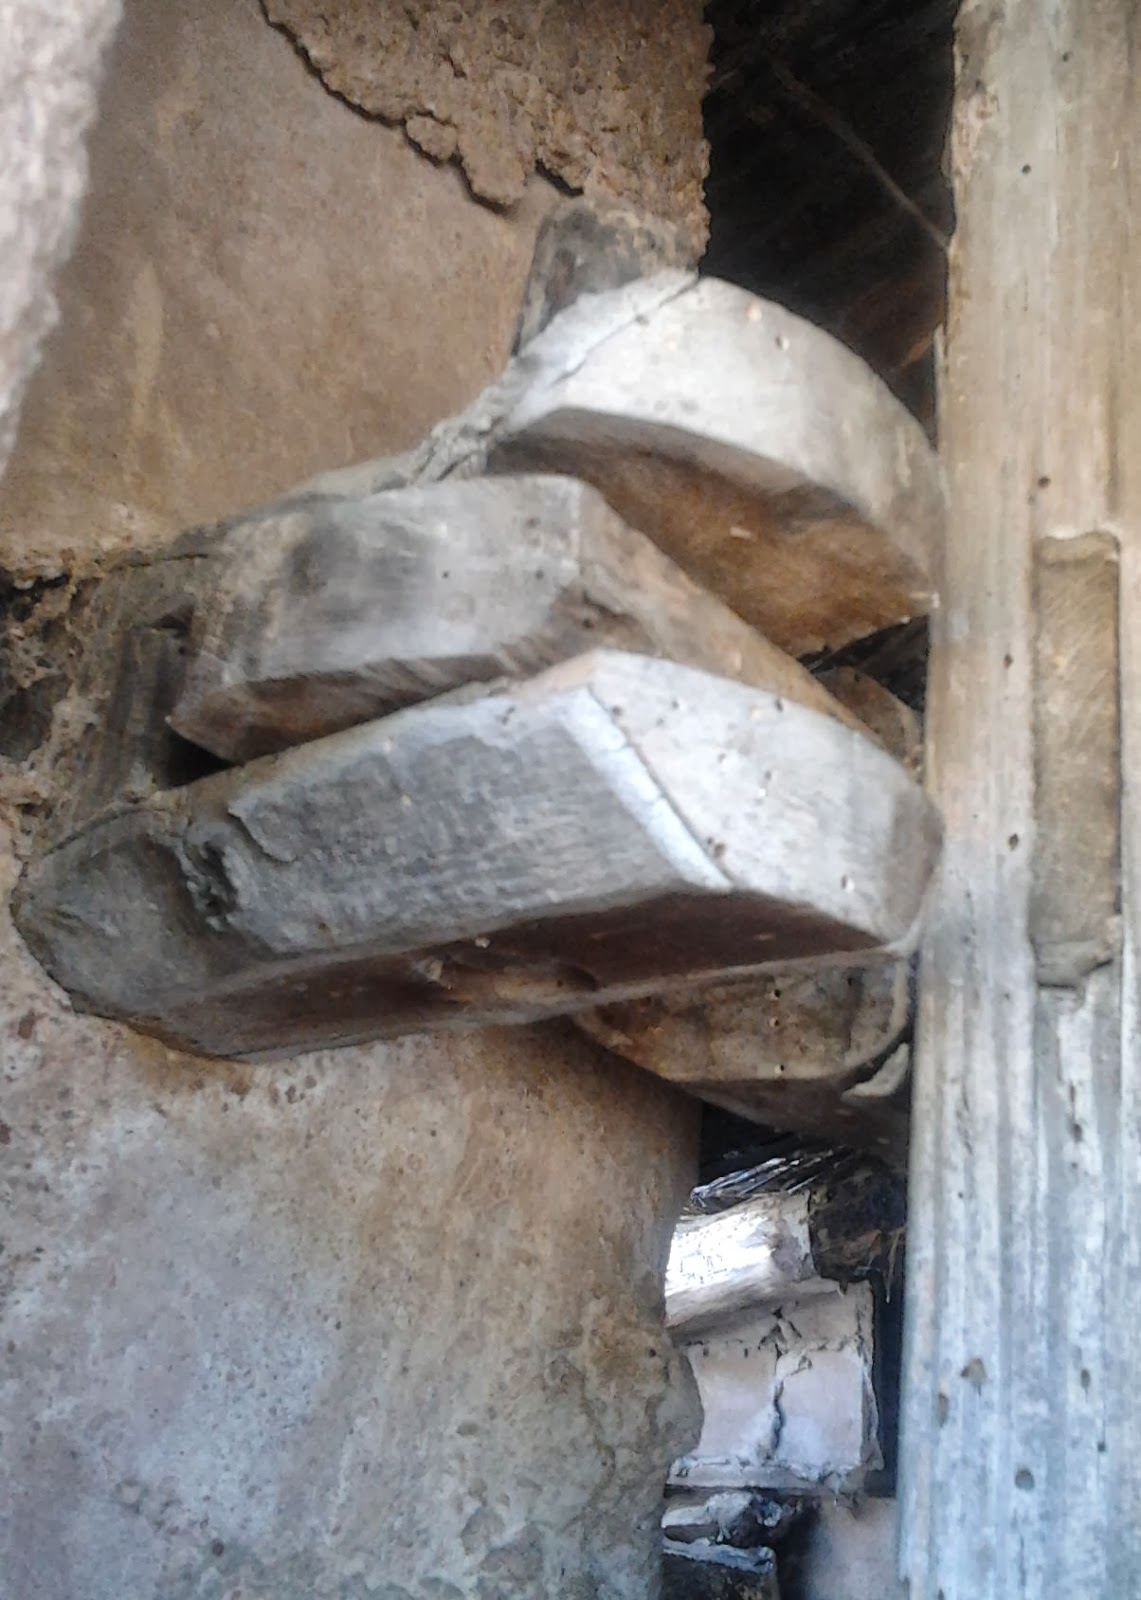 Aventuras en la palma d ebre bisagras de madera - Bisagras para madera ...